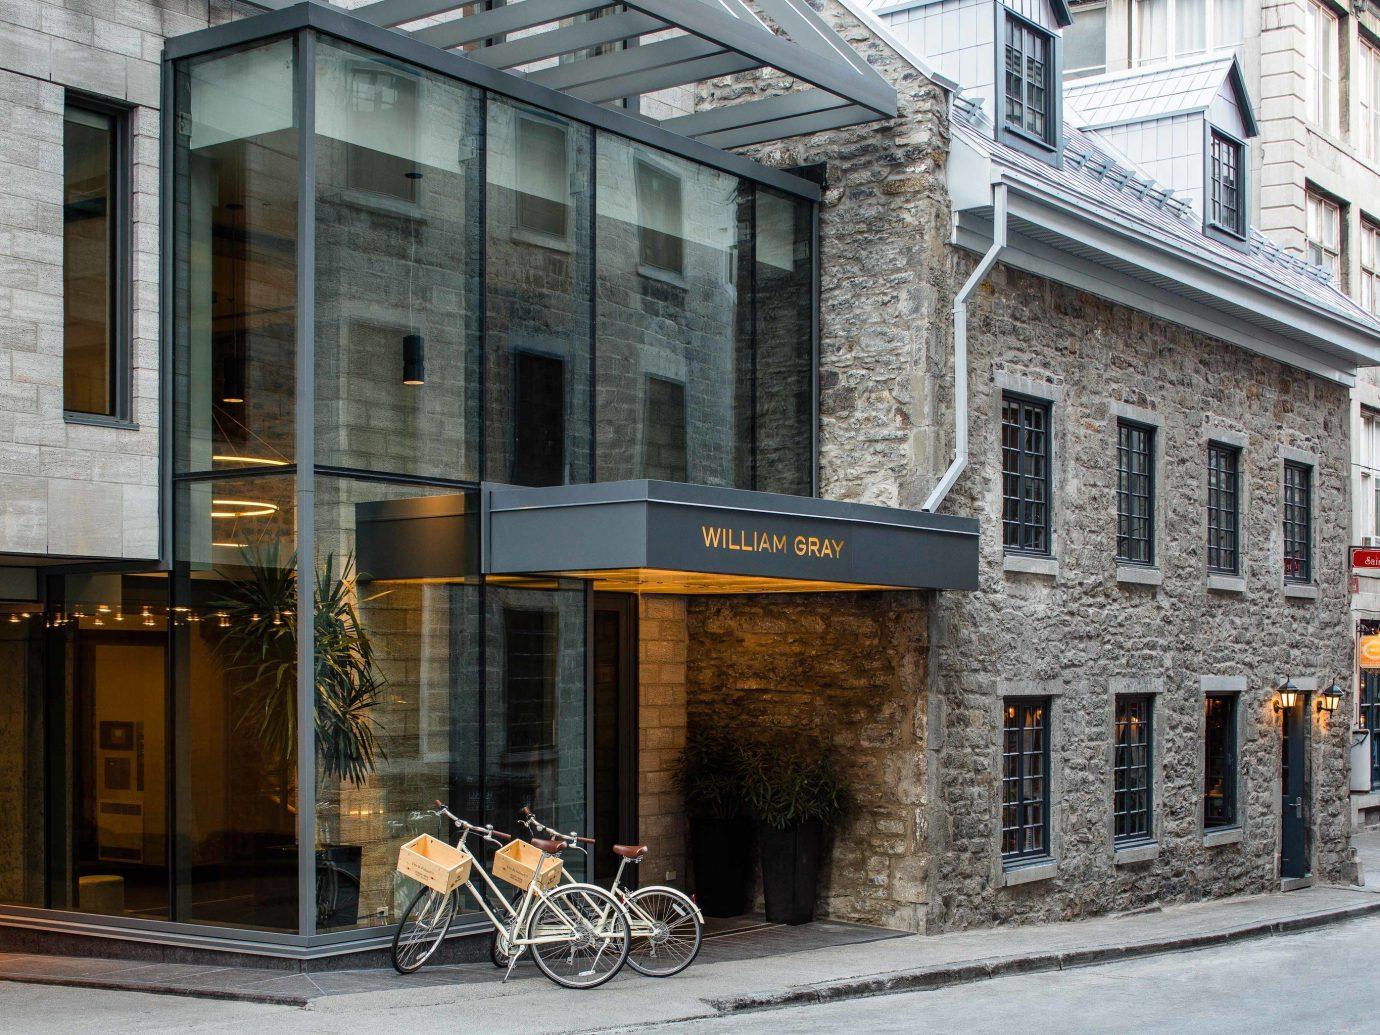 Canada Hotels Montreal Trip Ideas building Architecture City neighbourhood mixed use metropolitan area facade Downtown street window house apartment condominium